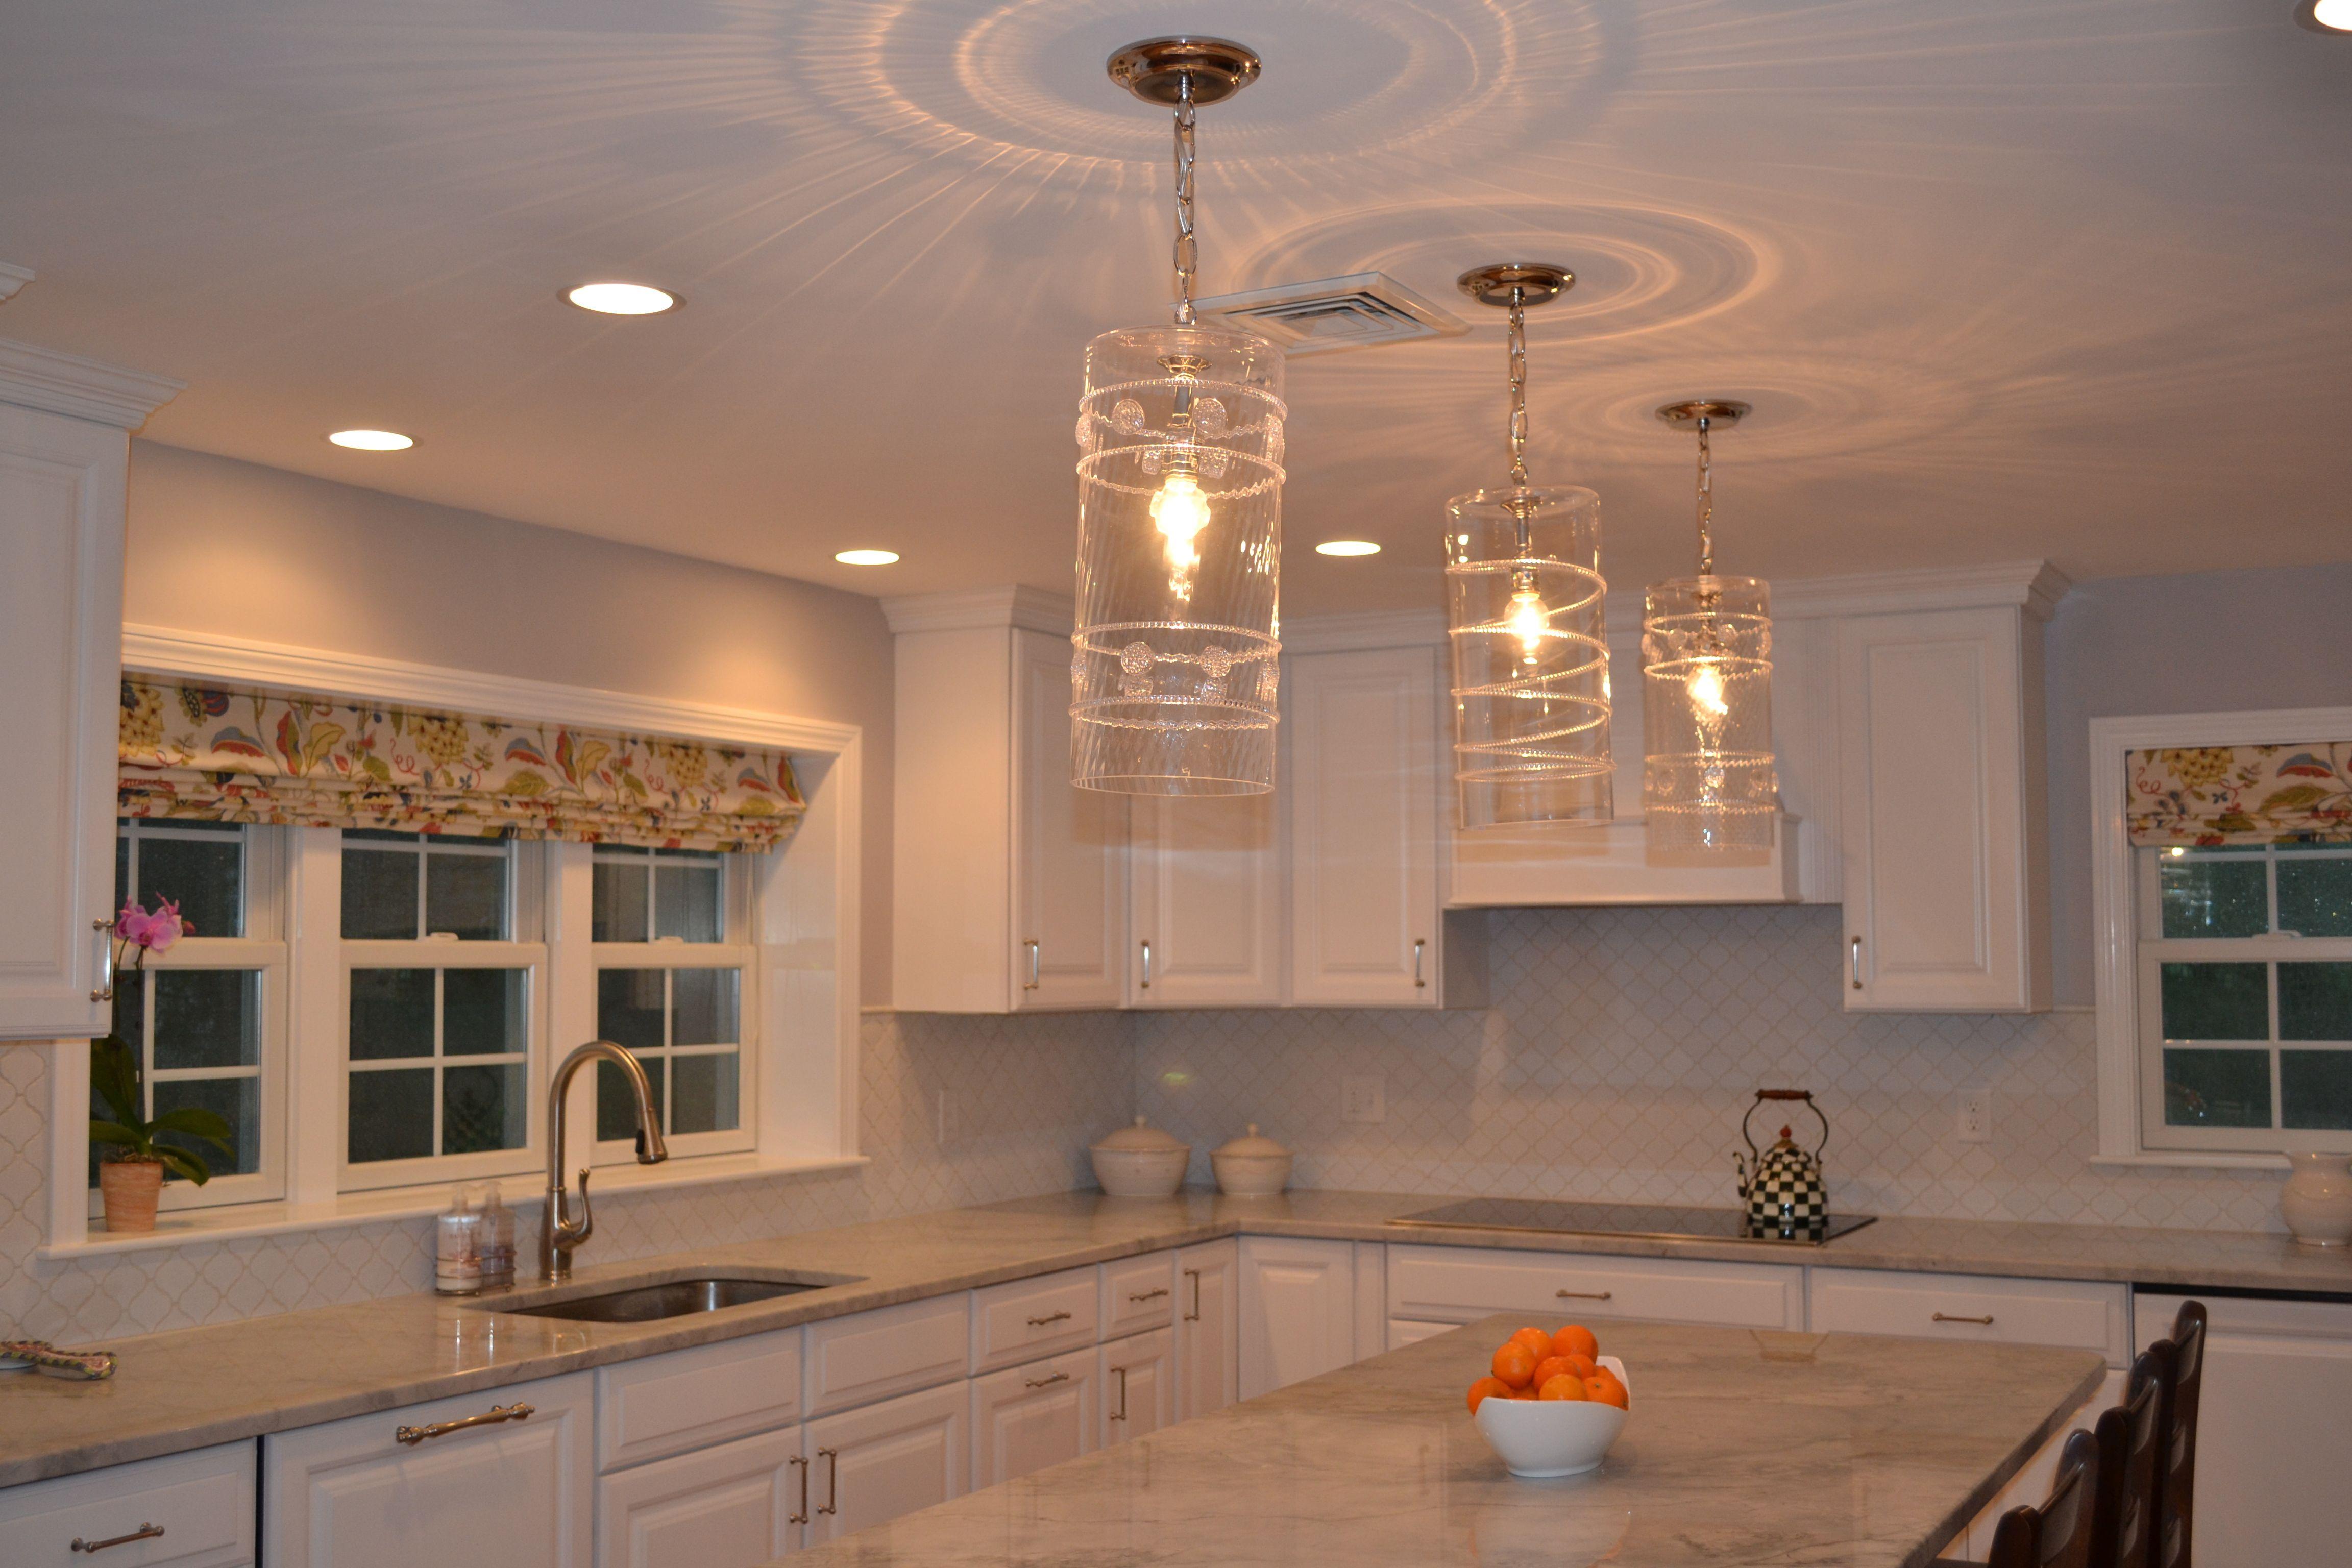 Juliska Pendant Lights Over Island Kitchen Lighting Kitchen